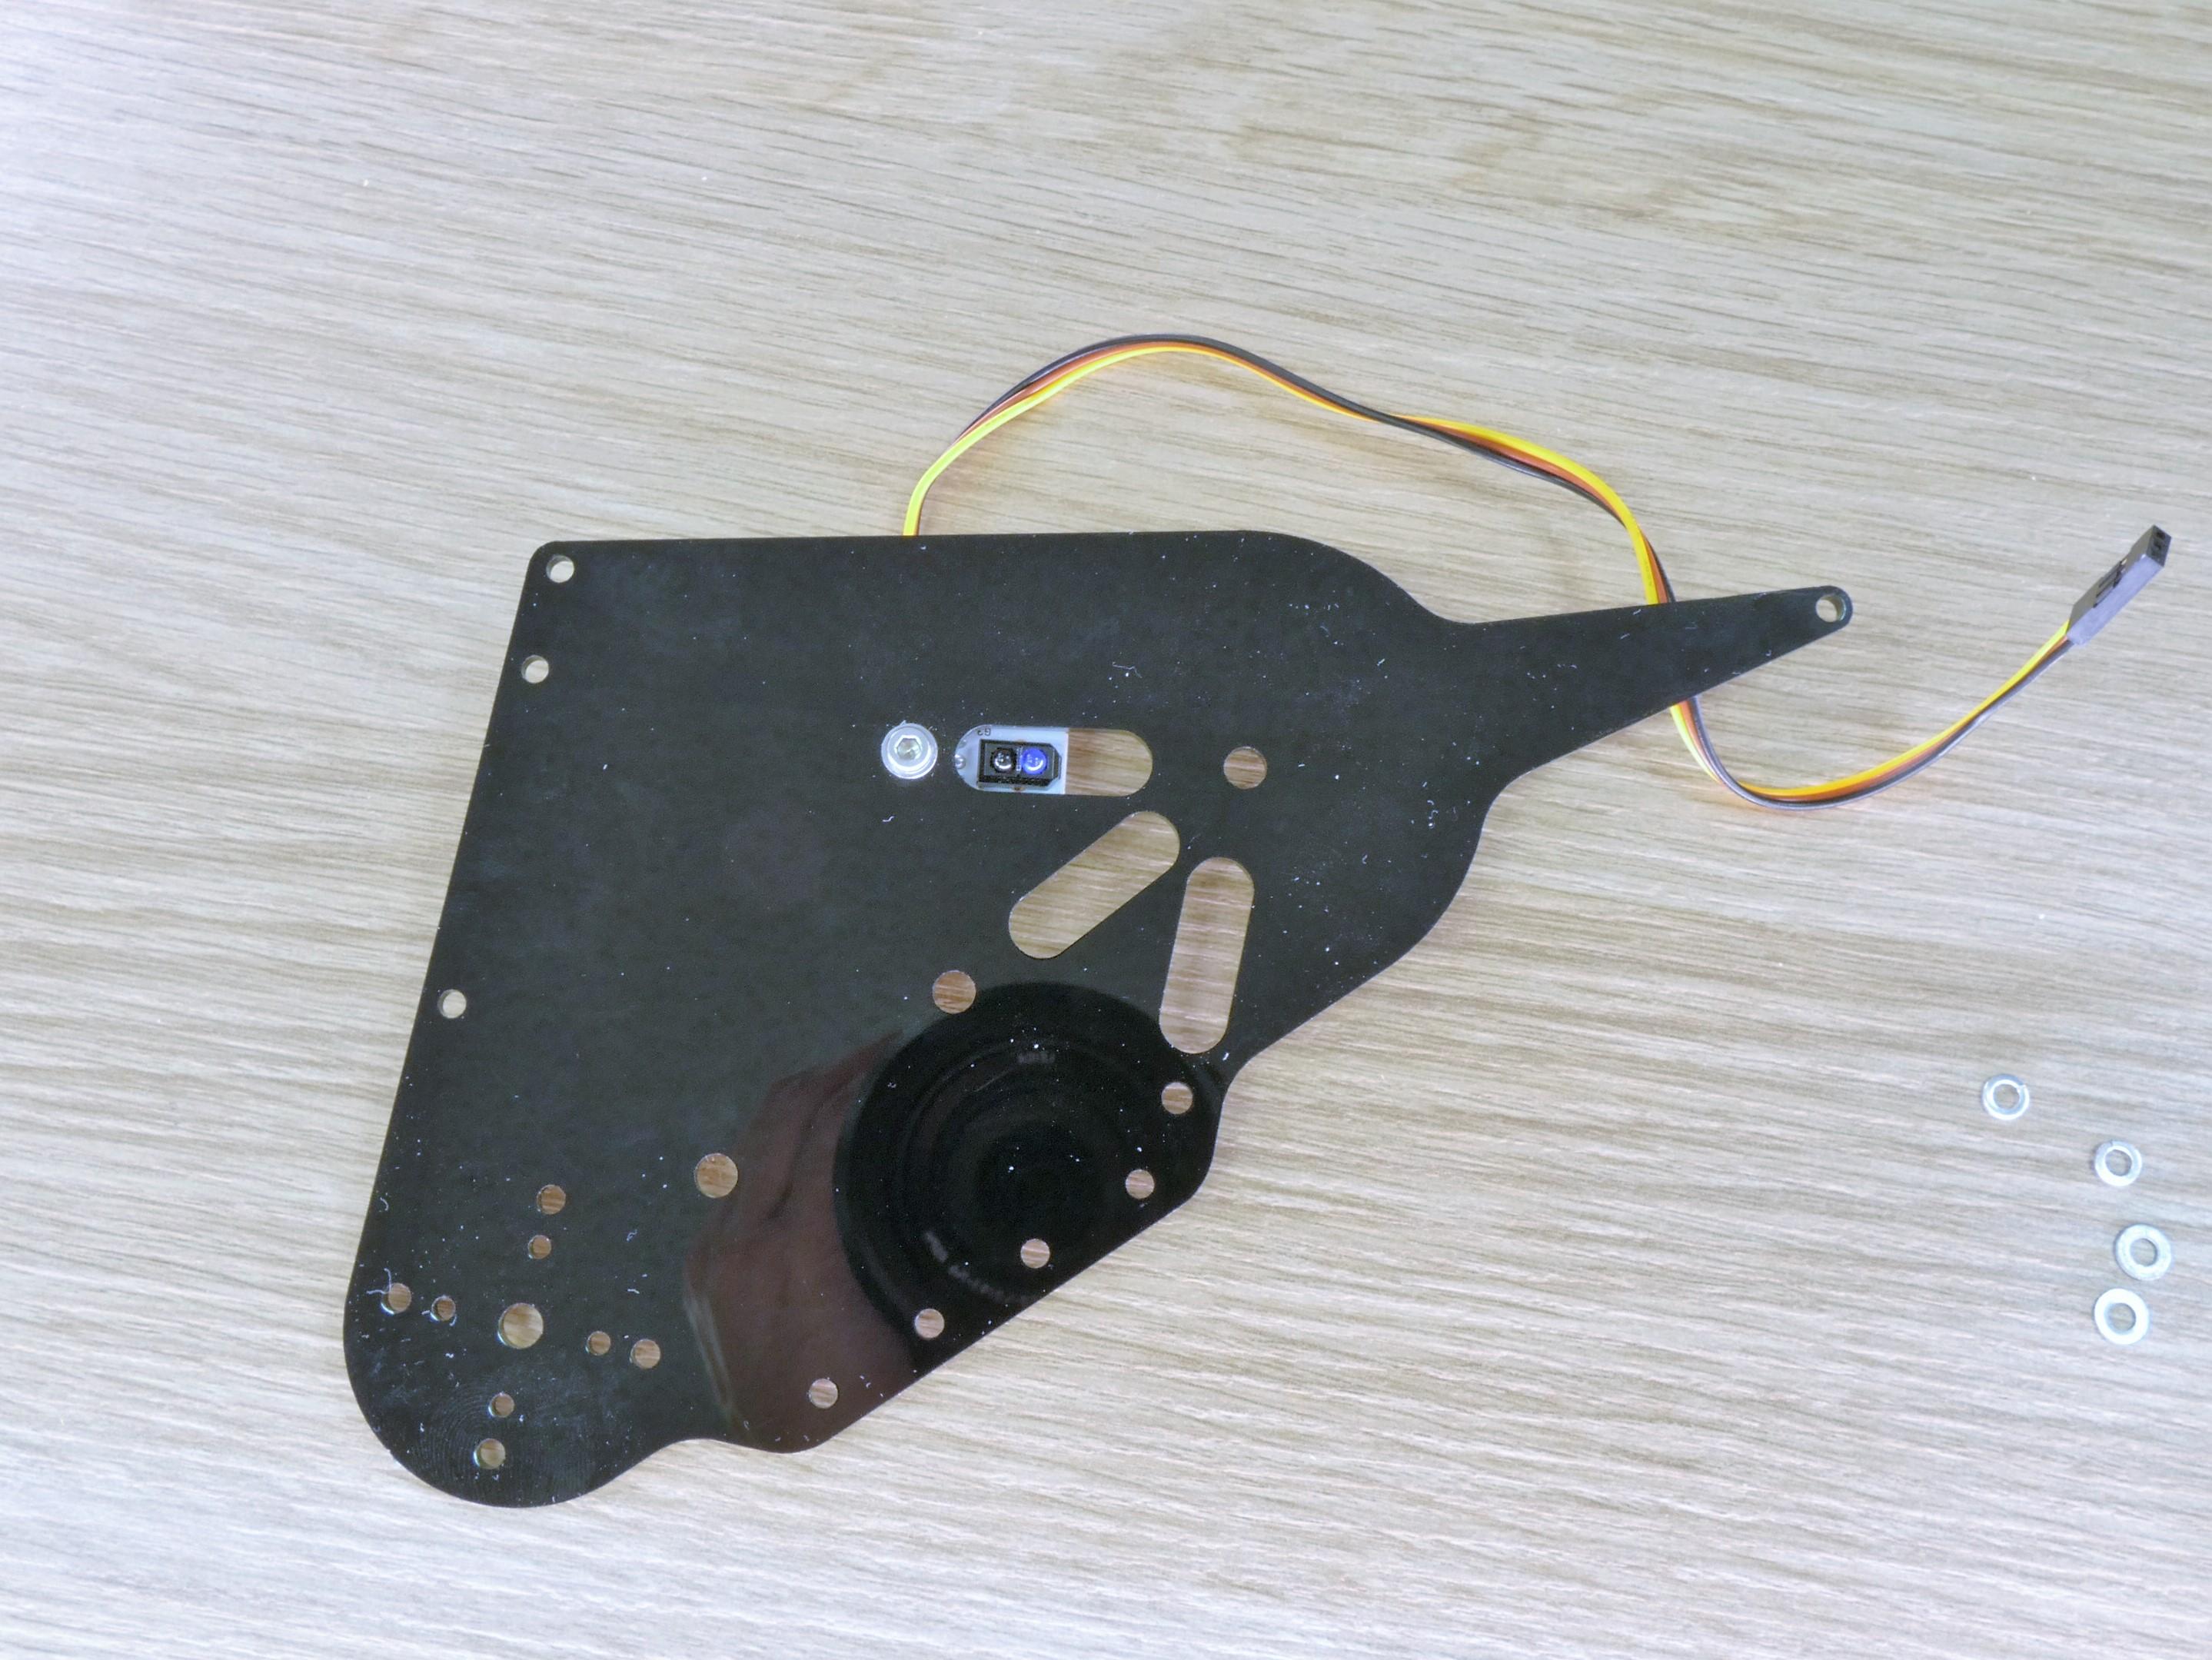 Picture of Mechanics. Assembling the Left Panel.